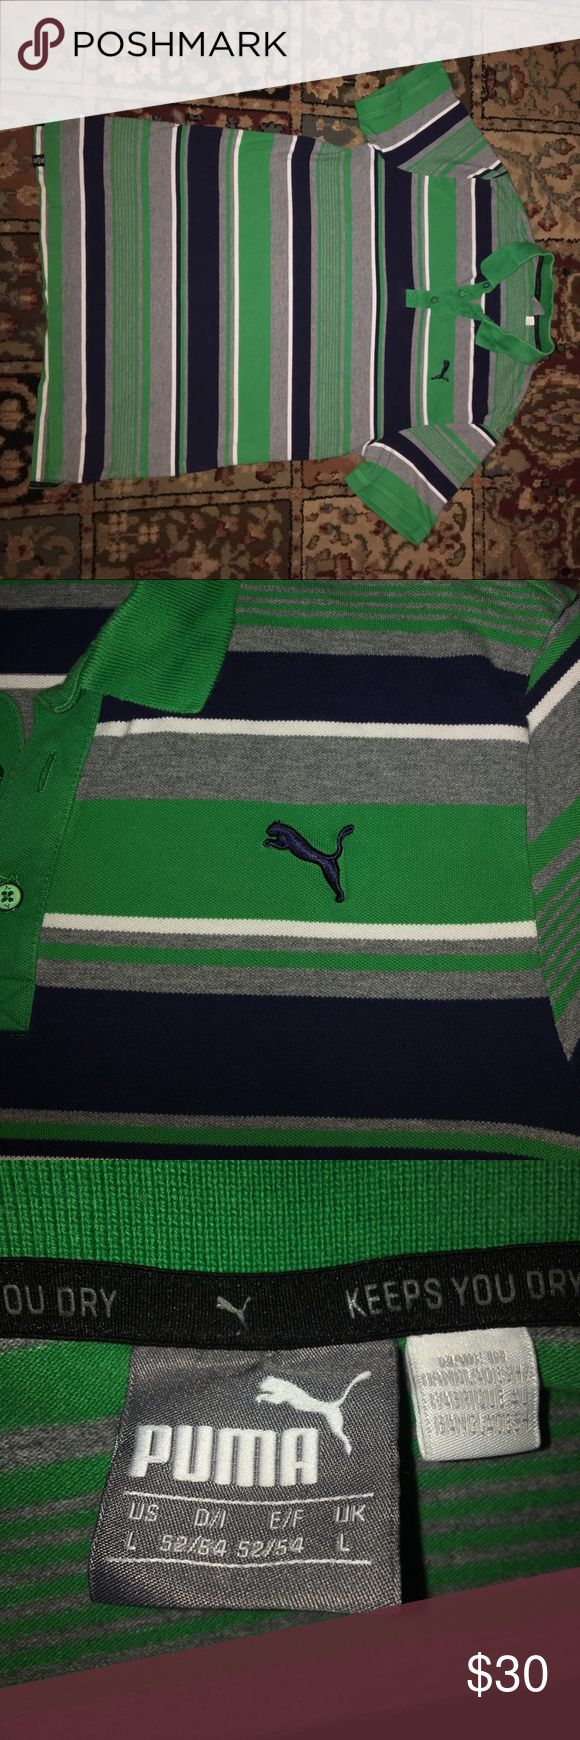 PUMA t-shirt Takin care of, gently worn puma shirt. Great condition :) ( Green , dark blue , white, and grey ) Puma Shirts Tees - Short Sleeve